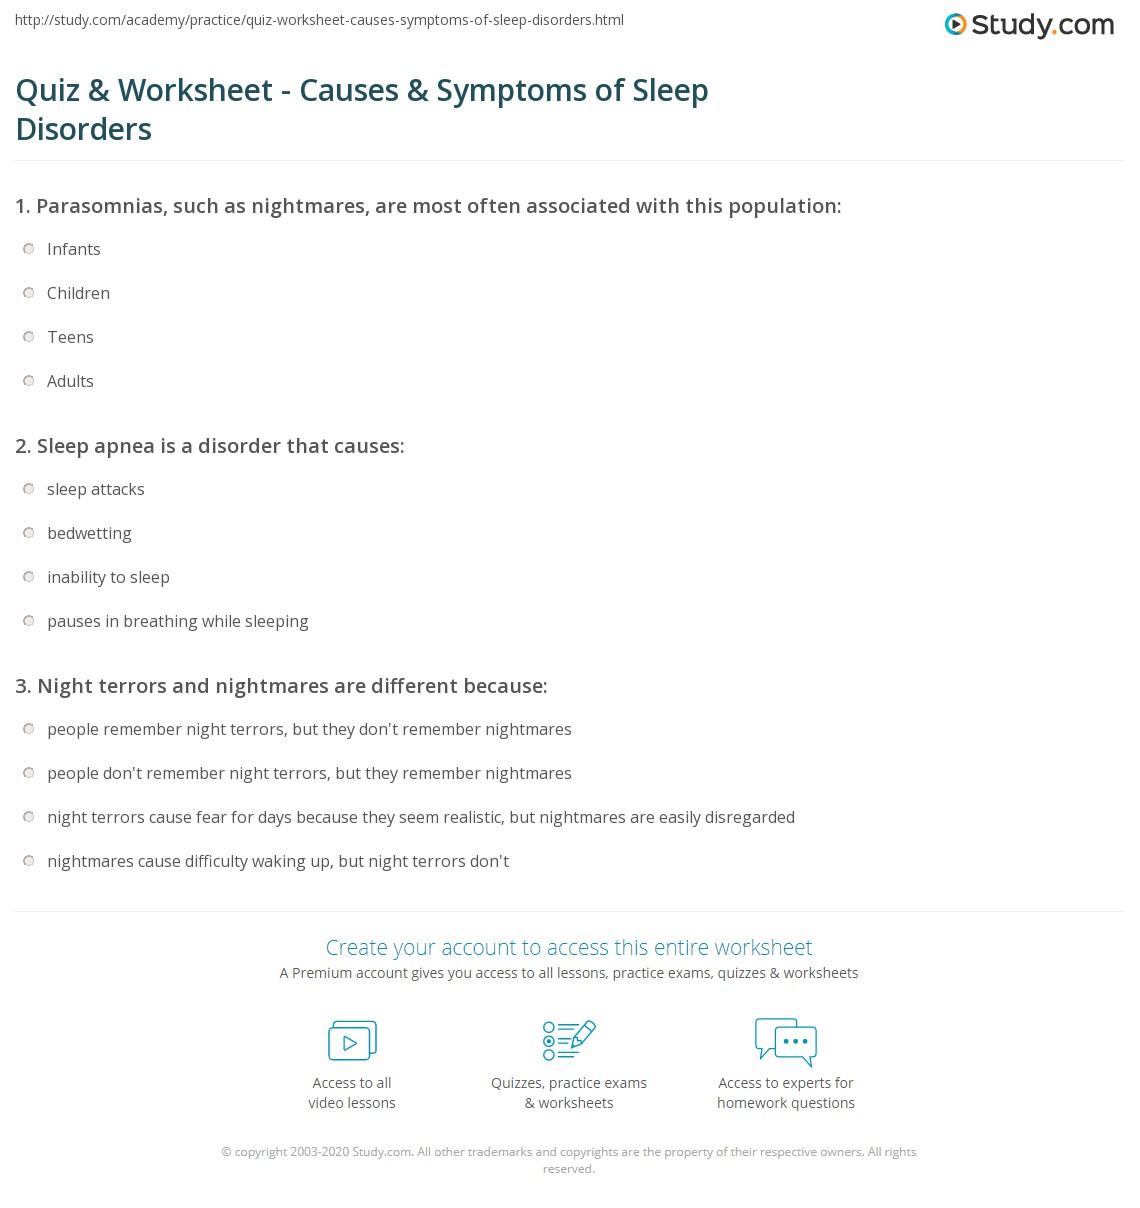 Sleep apnea study in infants